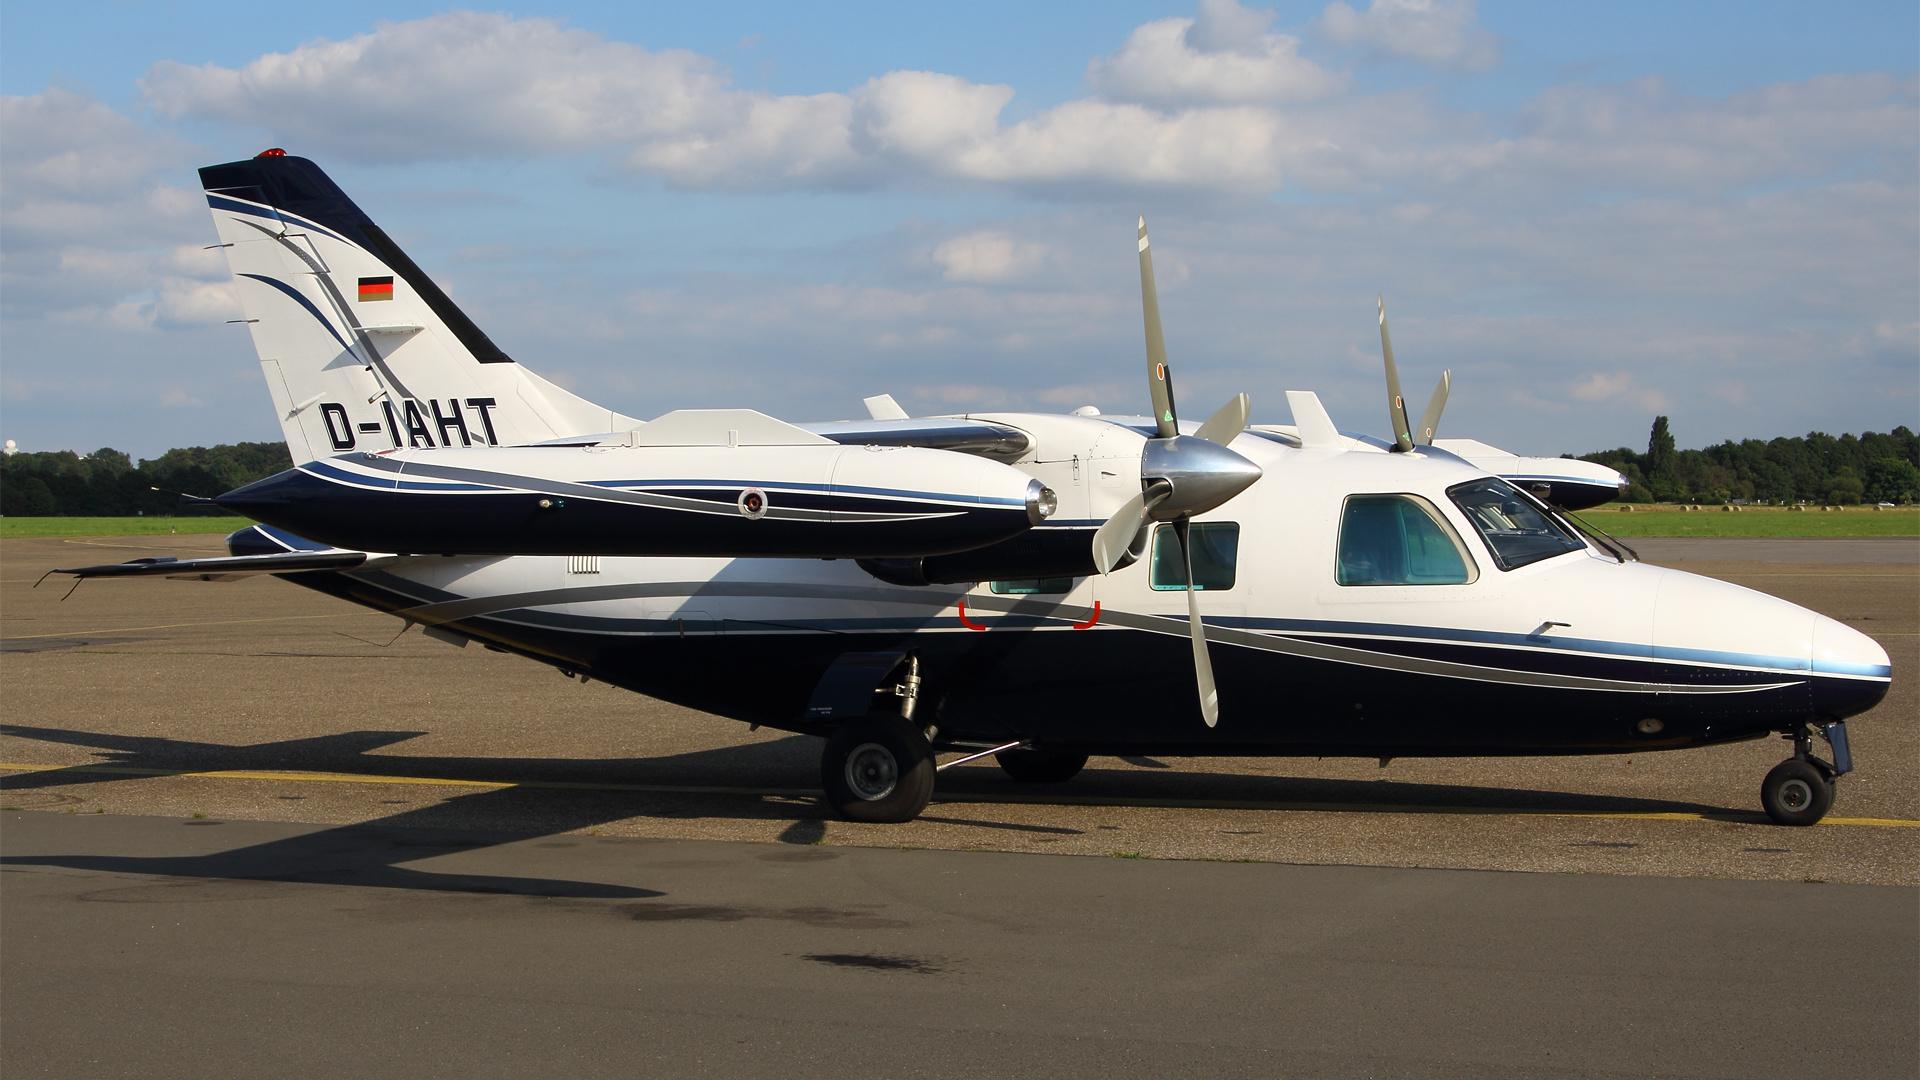 D-IAHT-1 MU2 ESS 201208